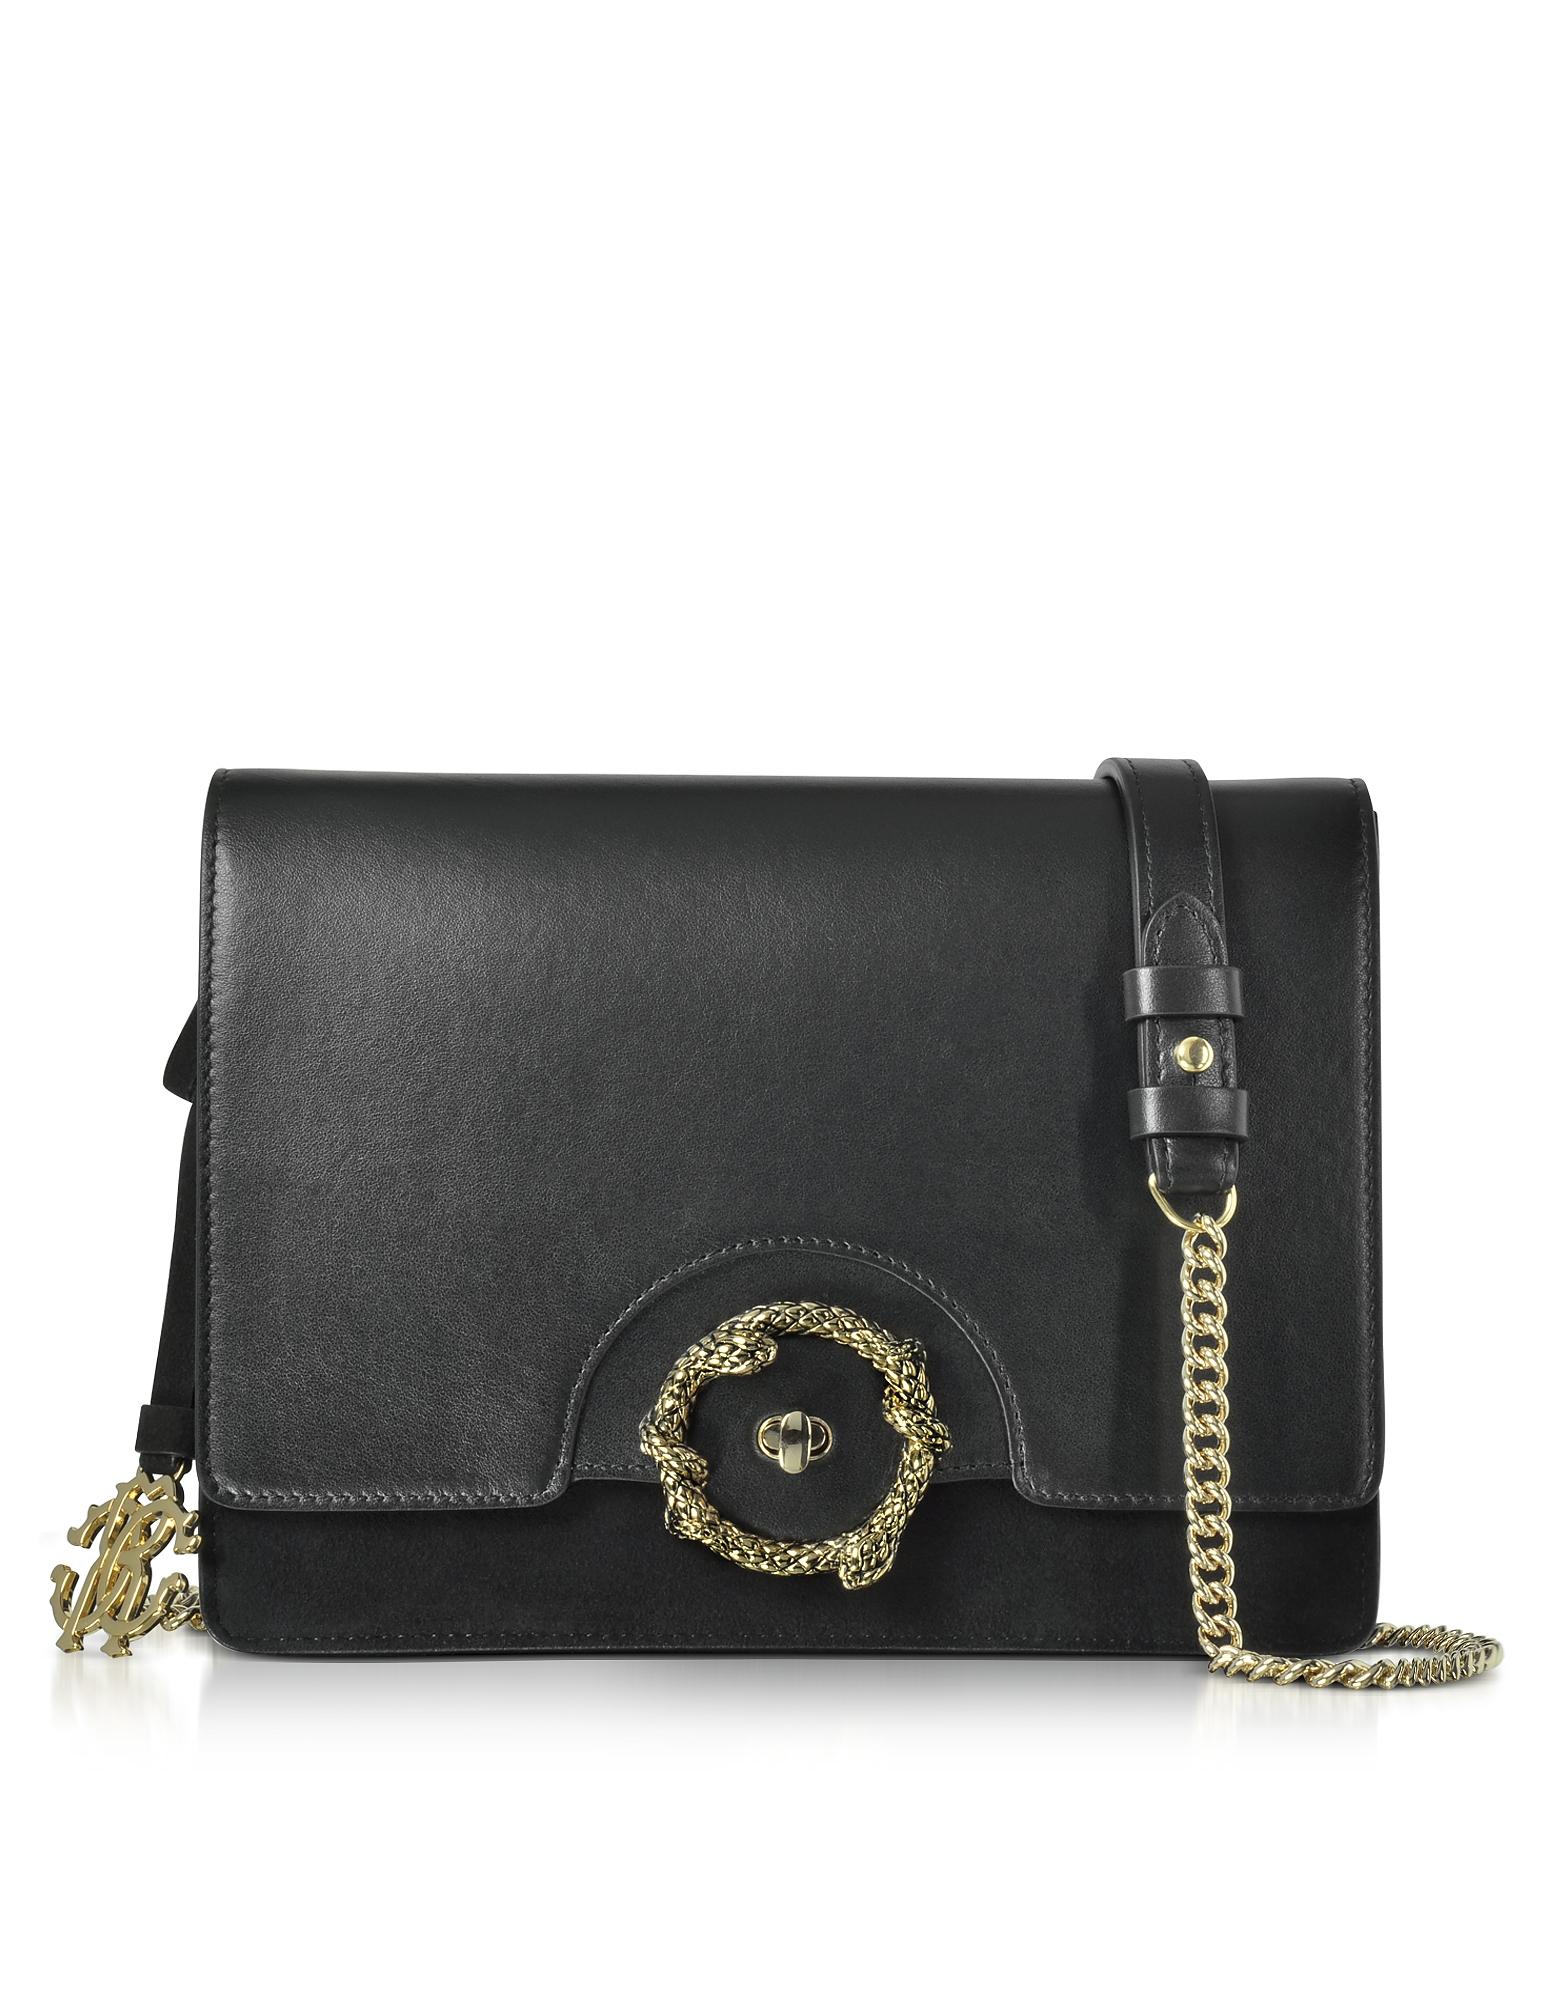 Roberto Cavalli Handbags, Genuine Leather and Suede Shoulder Bag